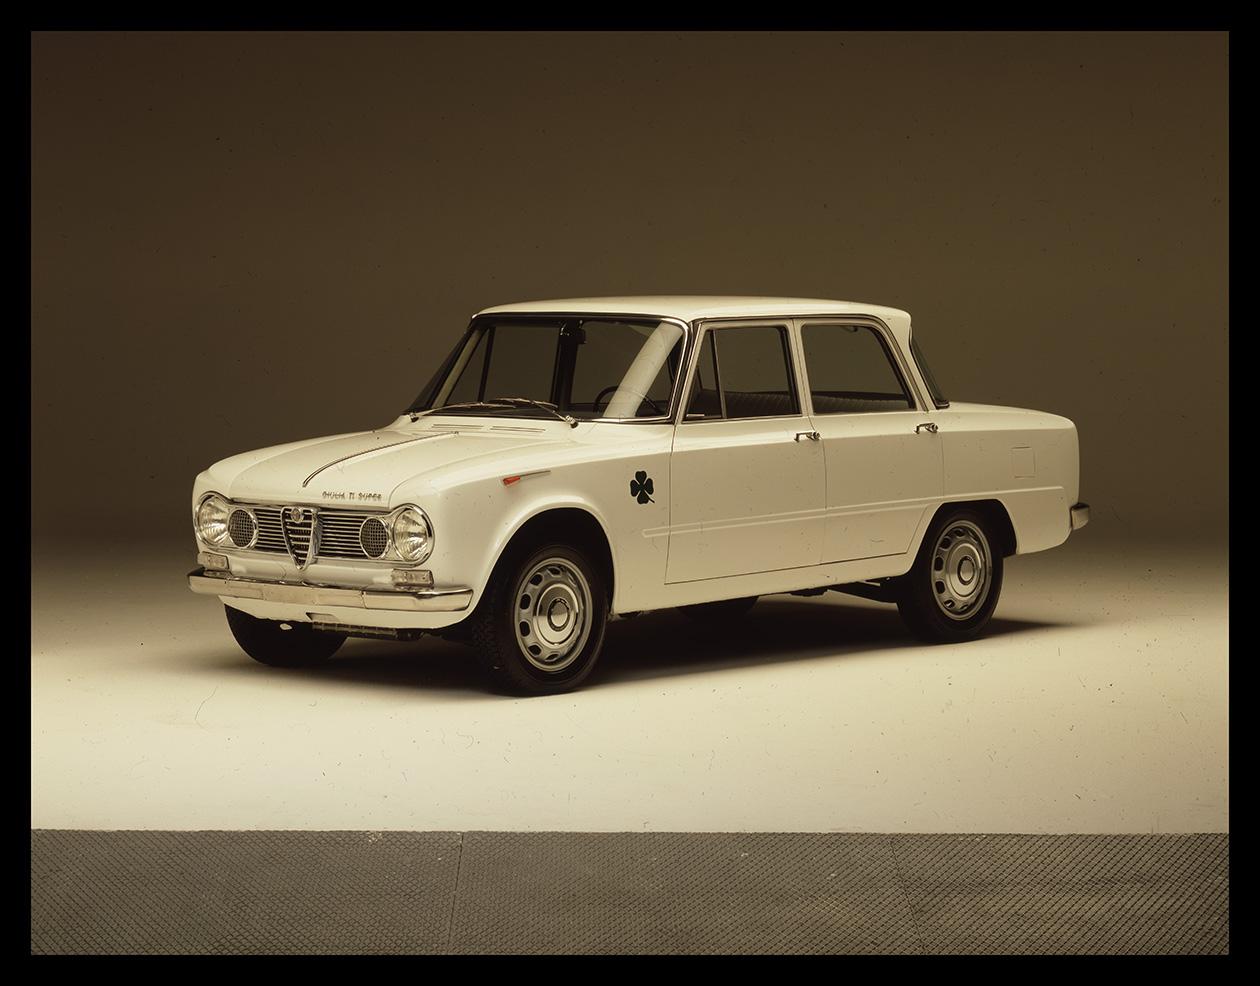 Giulia%2BTI%2BSuper Δεν γνωρίζεις τι εστί Alfa Romeo άμα δεν γνωρίζεις την ιστορία της Alfa, alfa romeo, Alfa Romeo Soul, Alfisti, Giulia, Heritage, museoalfaromeo, videos, zblog